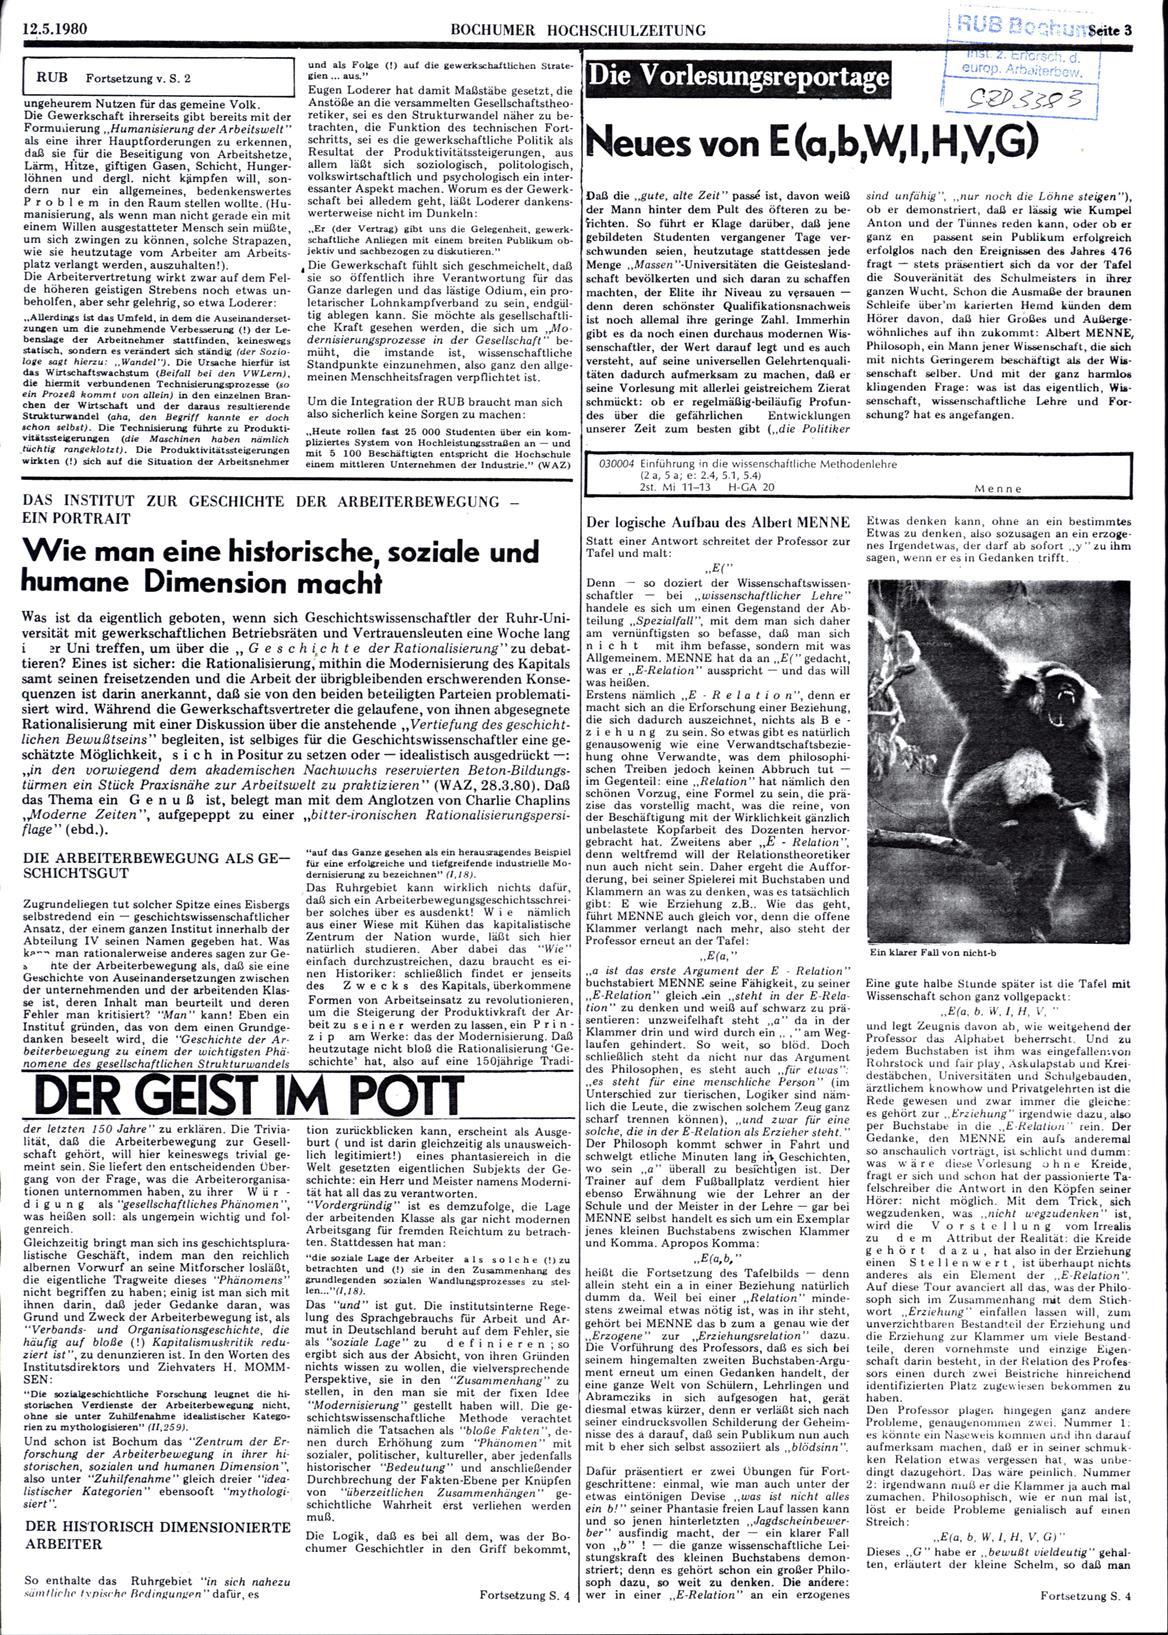 Bochum_BHZ_19800512_012_003